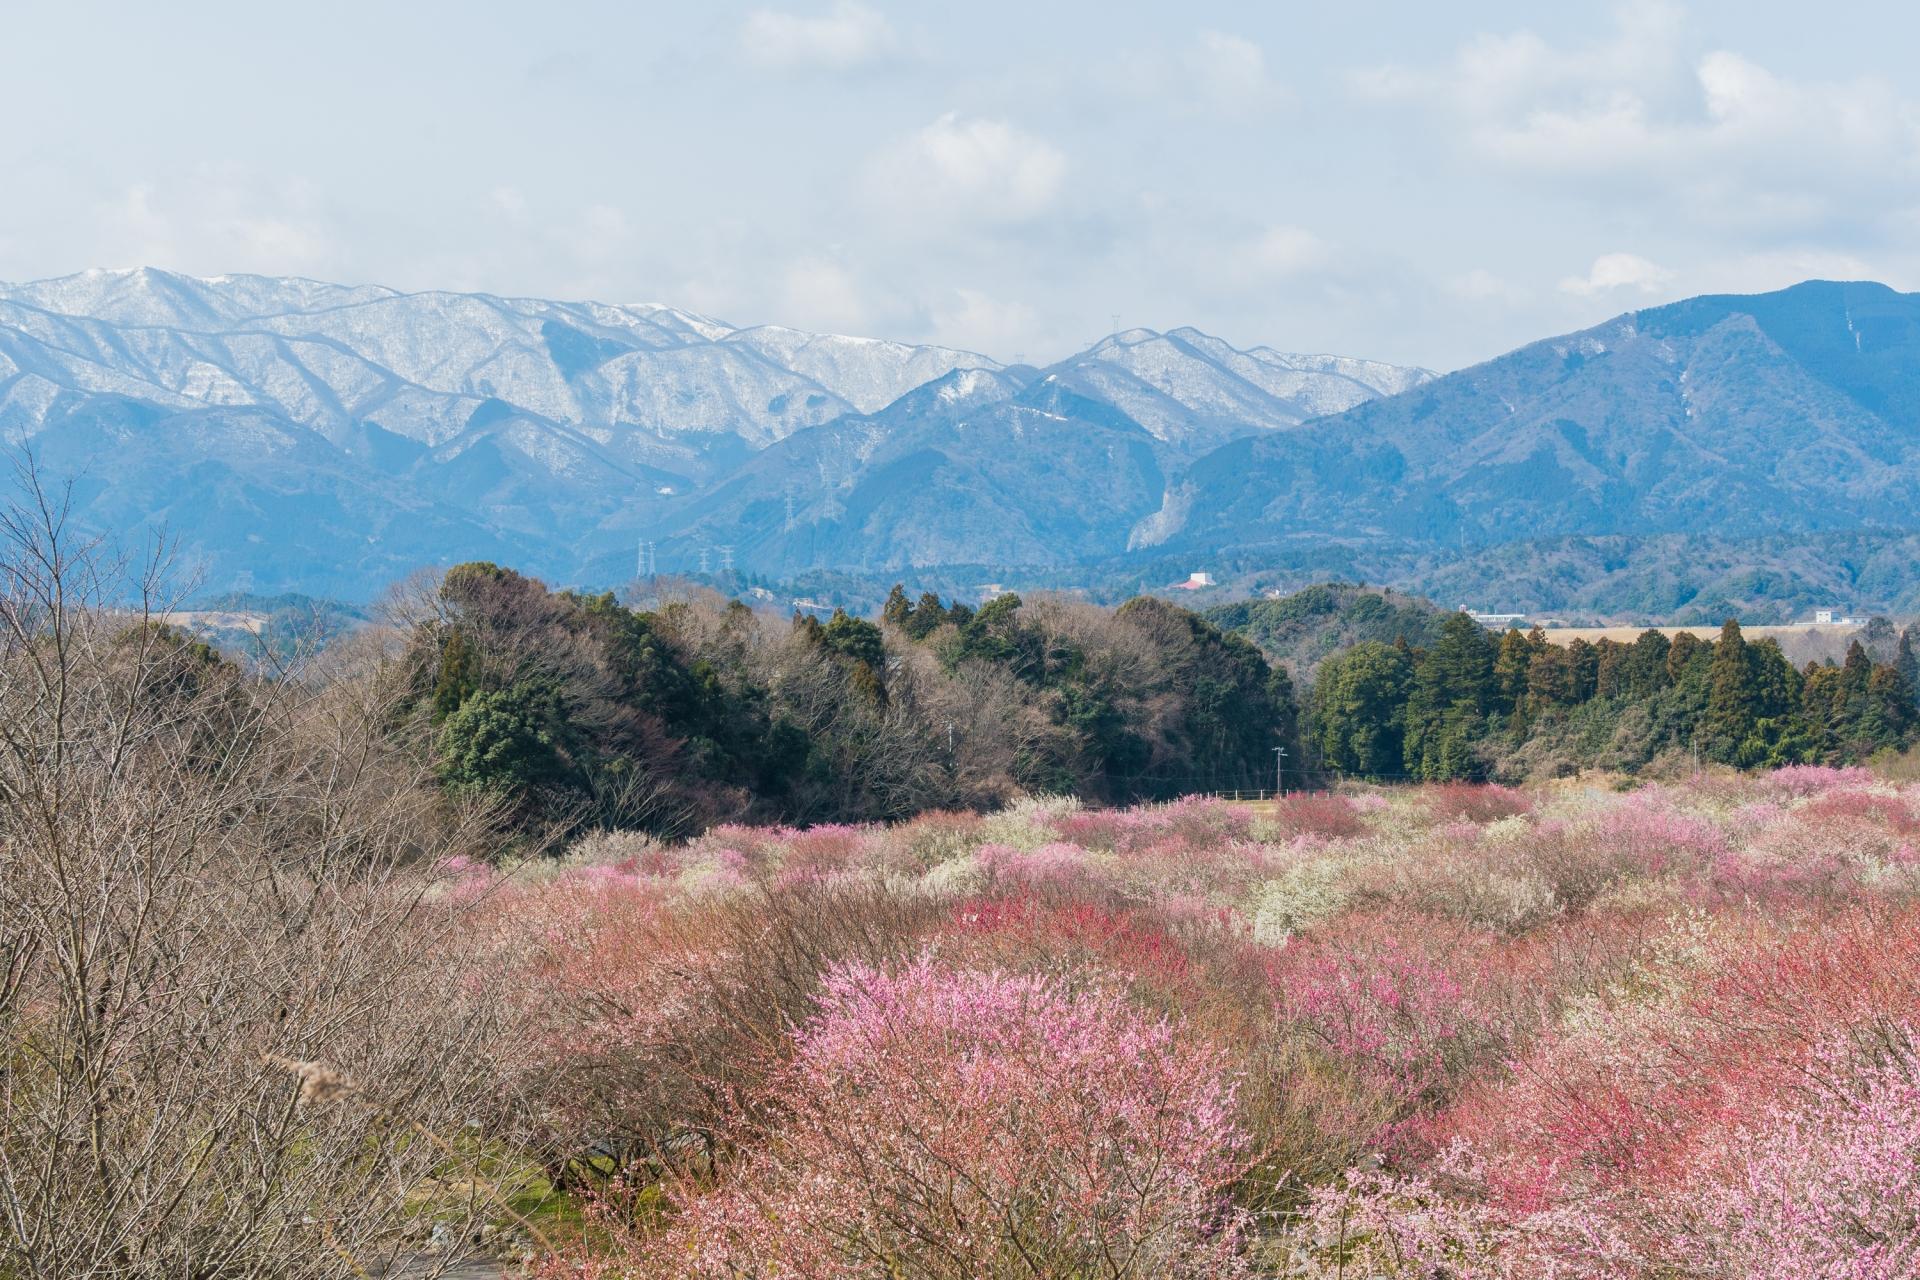 1482738_m 三重県 いなべ市農業公園 梅林園(まるで桃源郷のような景色が見れる絶景の梅林写真スポット。 写真の紹介、アクセス情報や交通手段・駐車場情報などまとめ)